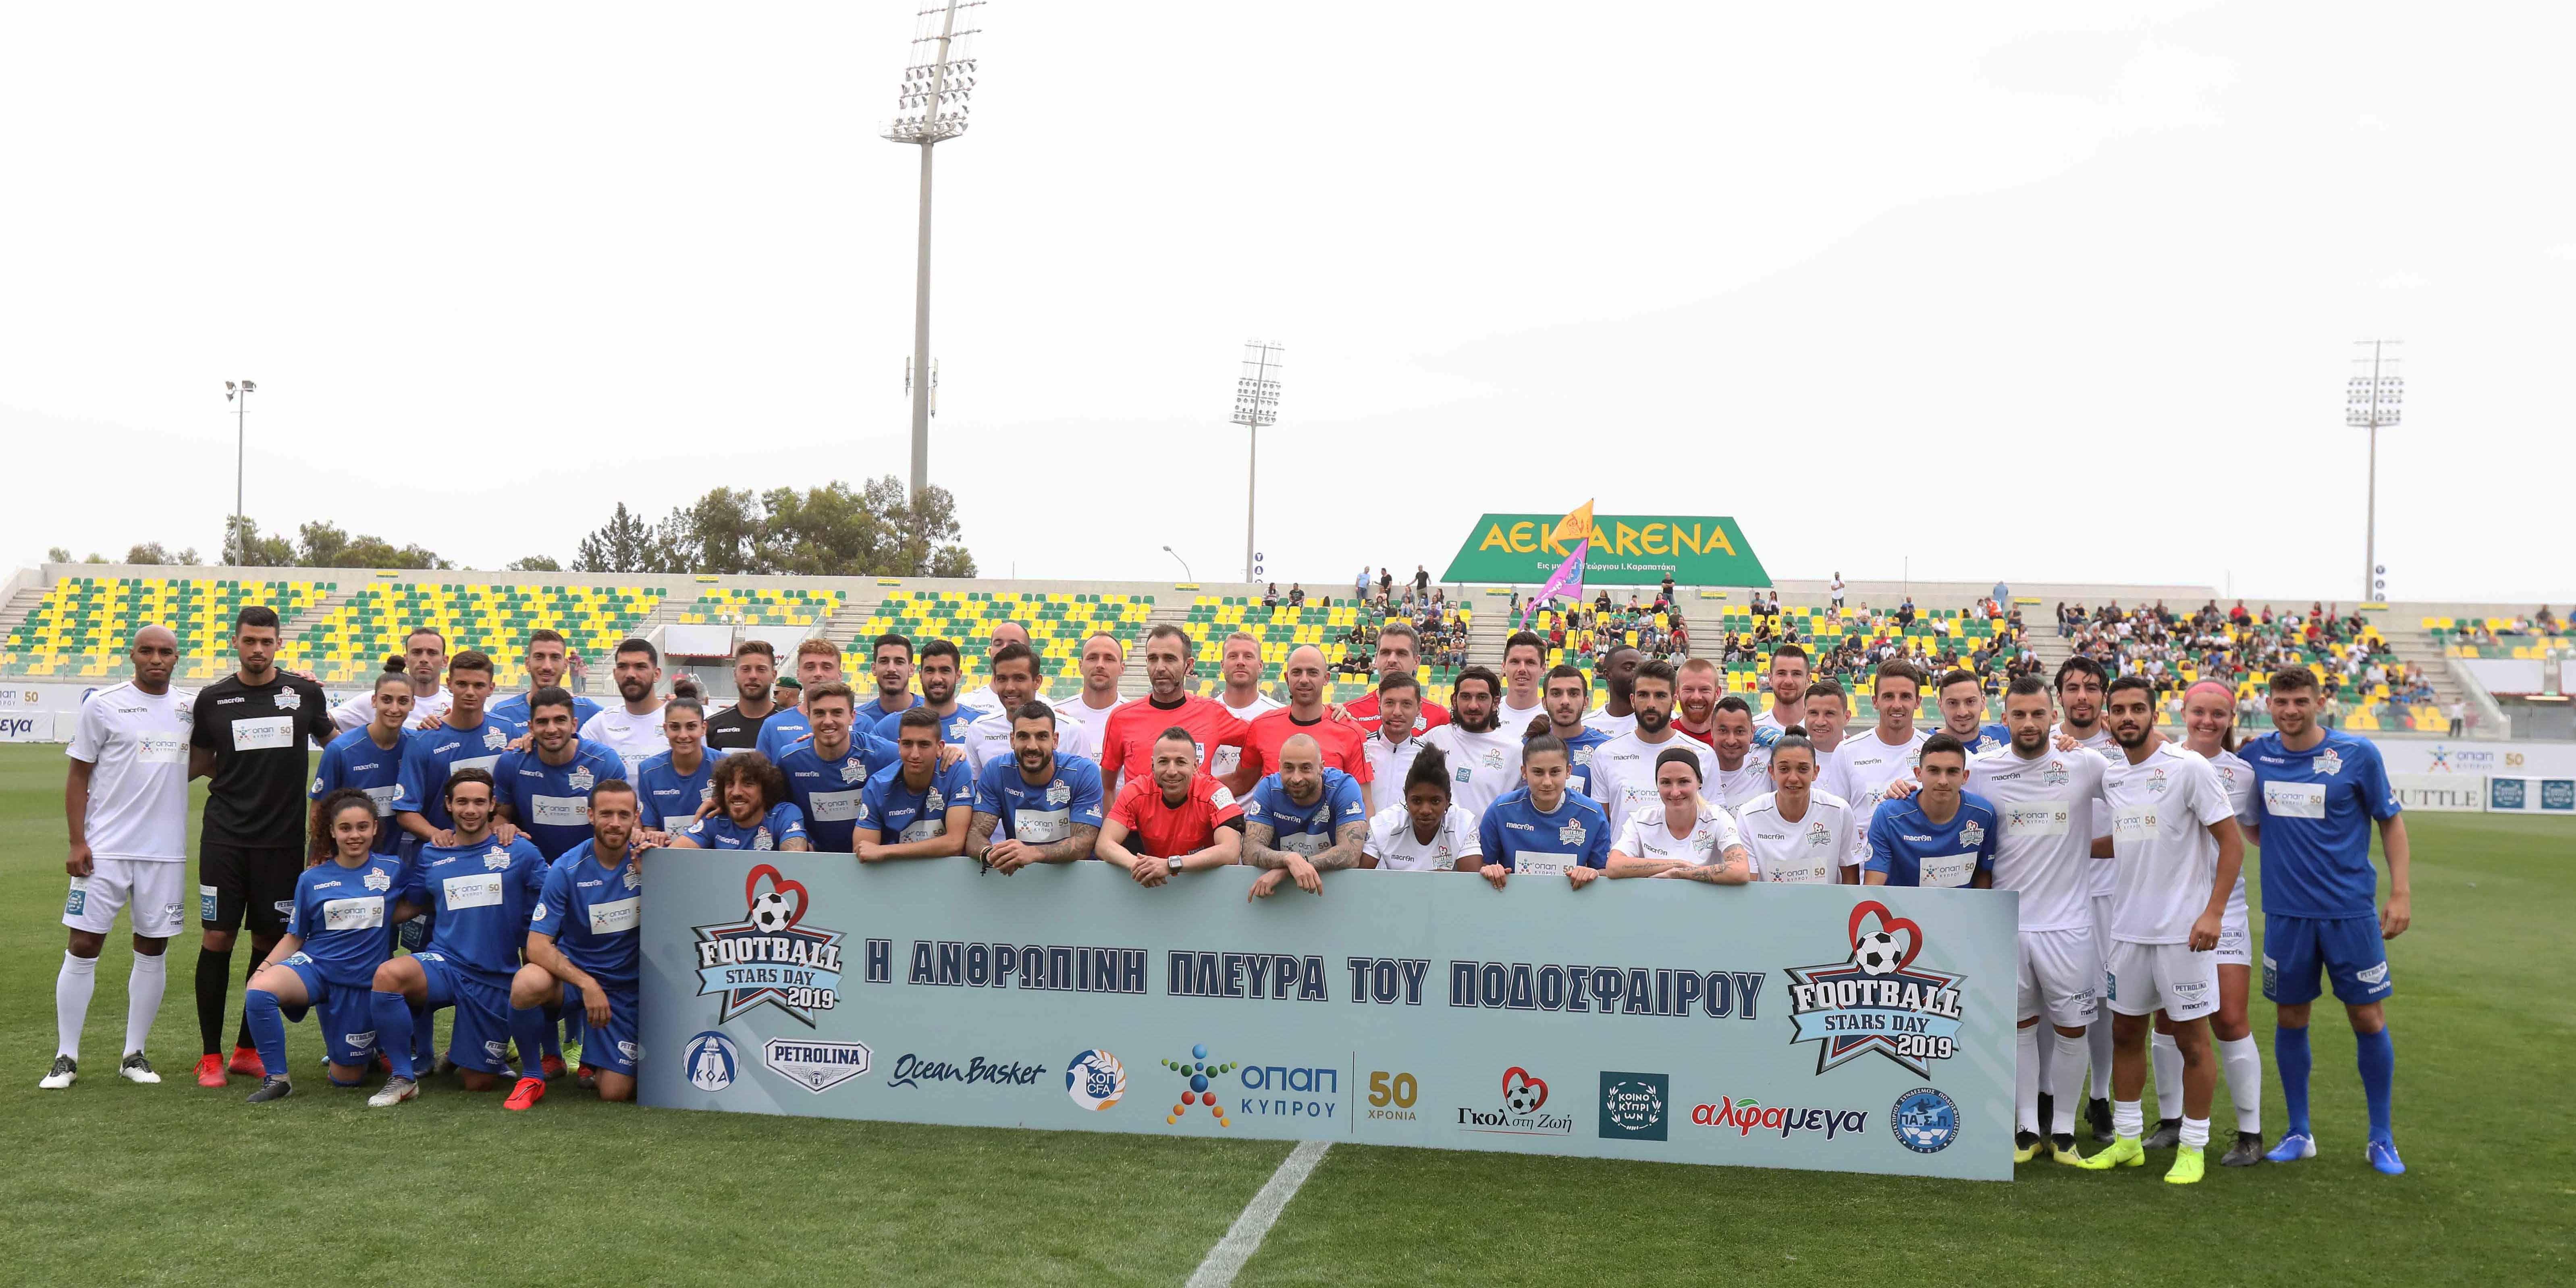 Football-Stars-Day-2019-Review.jpg